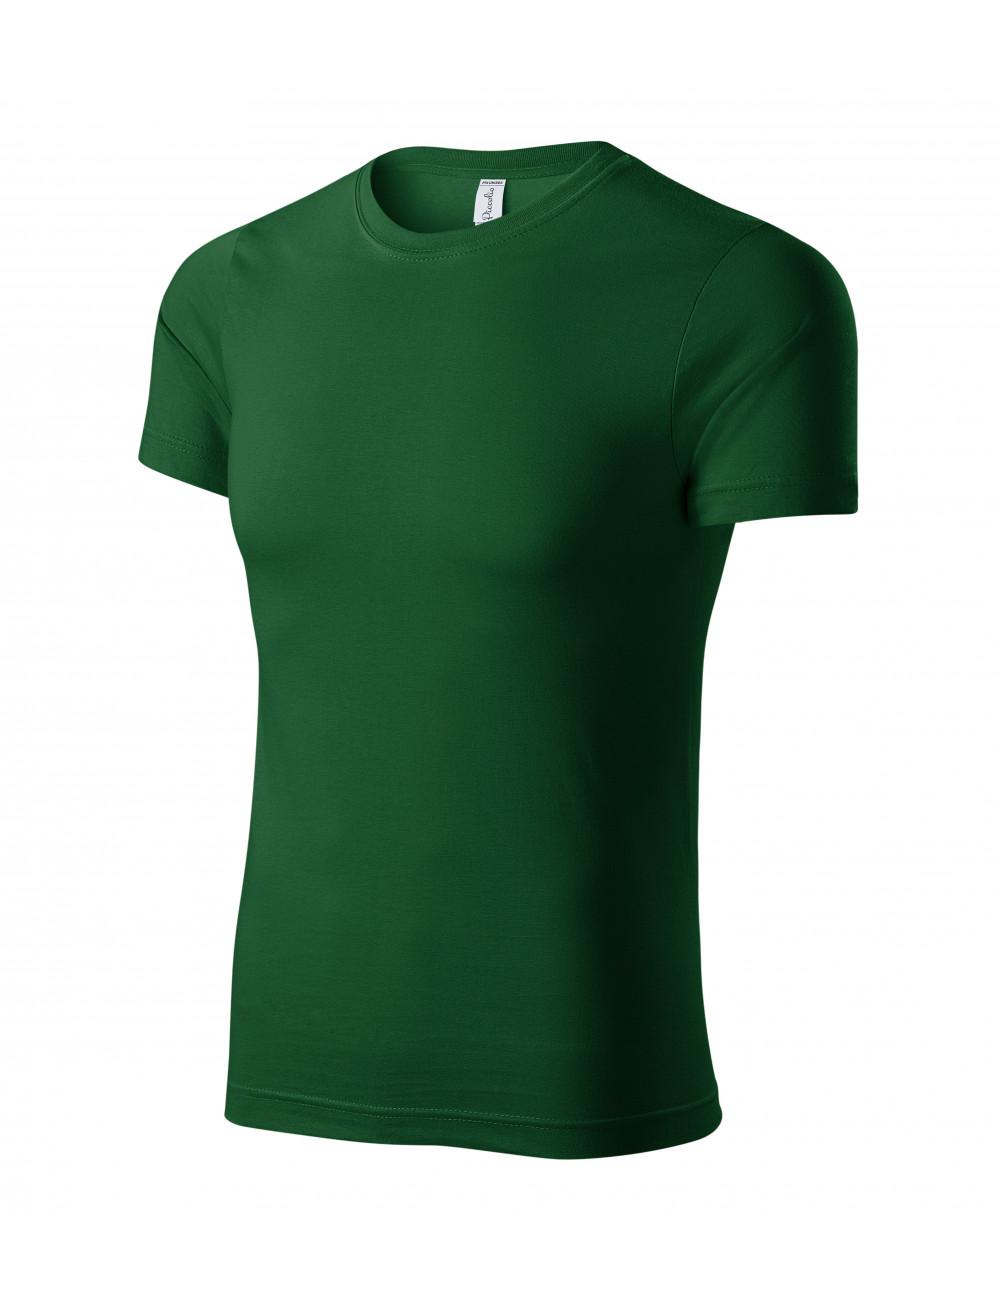 Adler PICCOLIO Koszulka unisex Peak P74 zieleń butelkowa